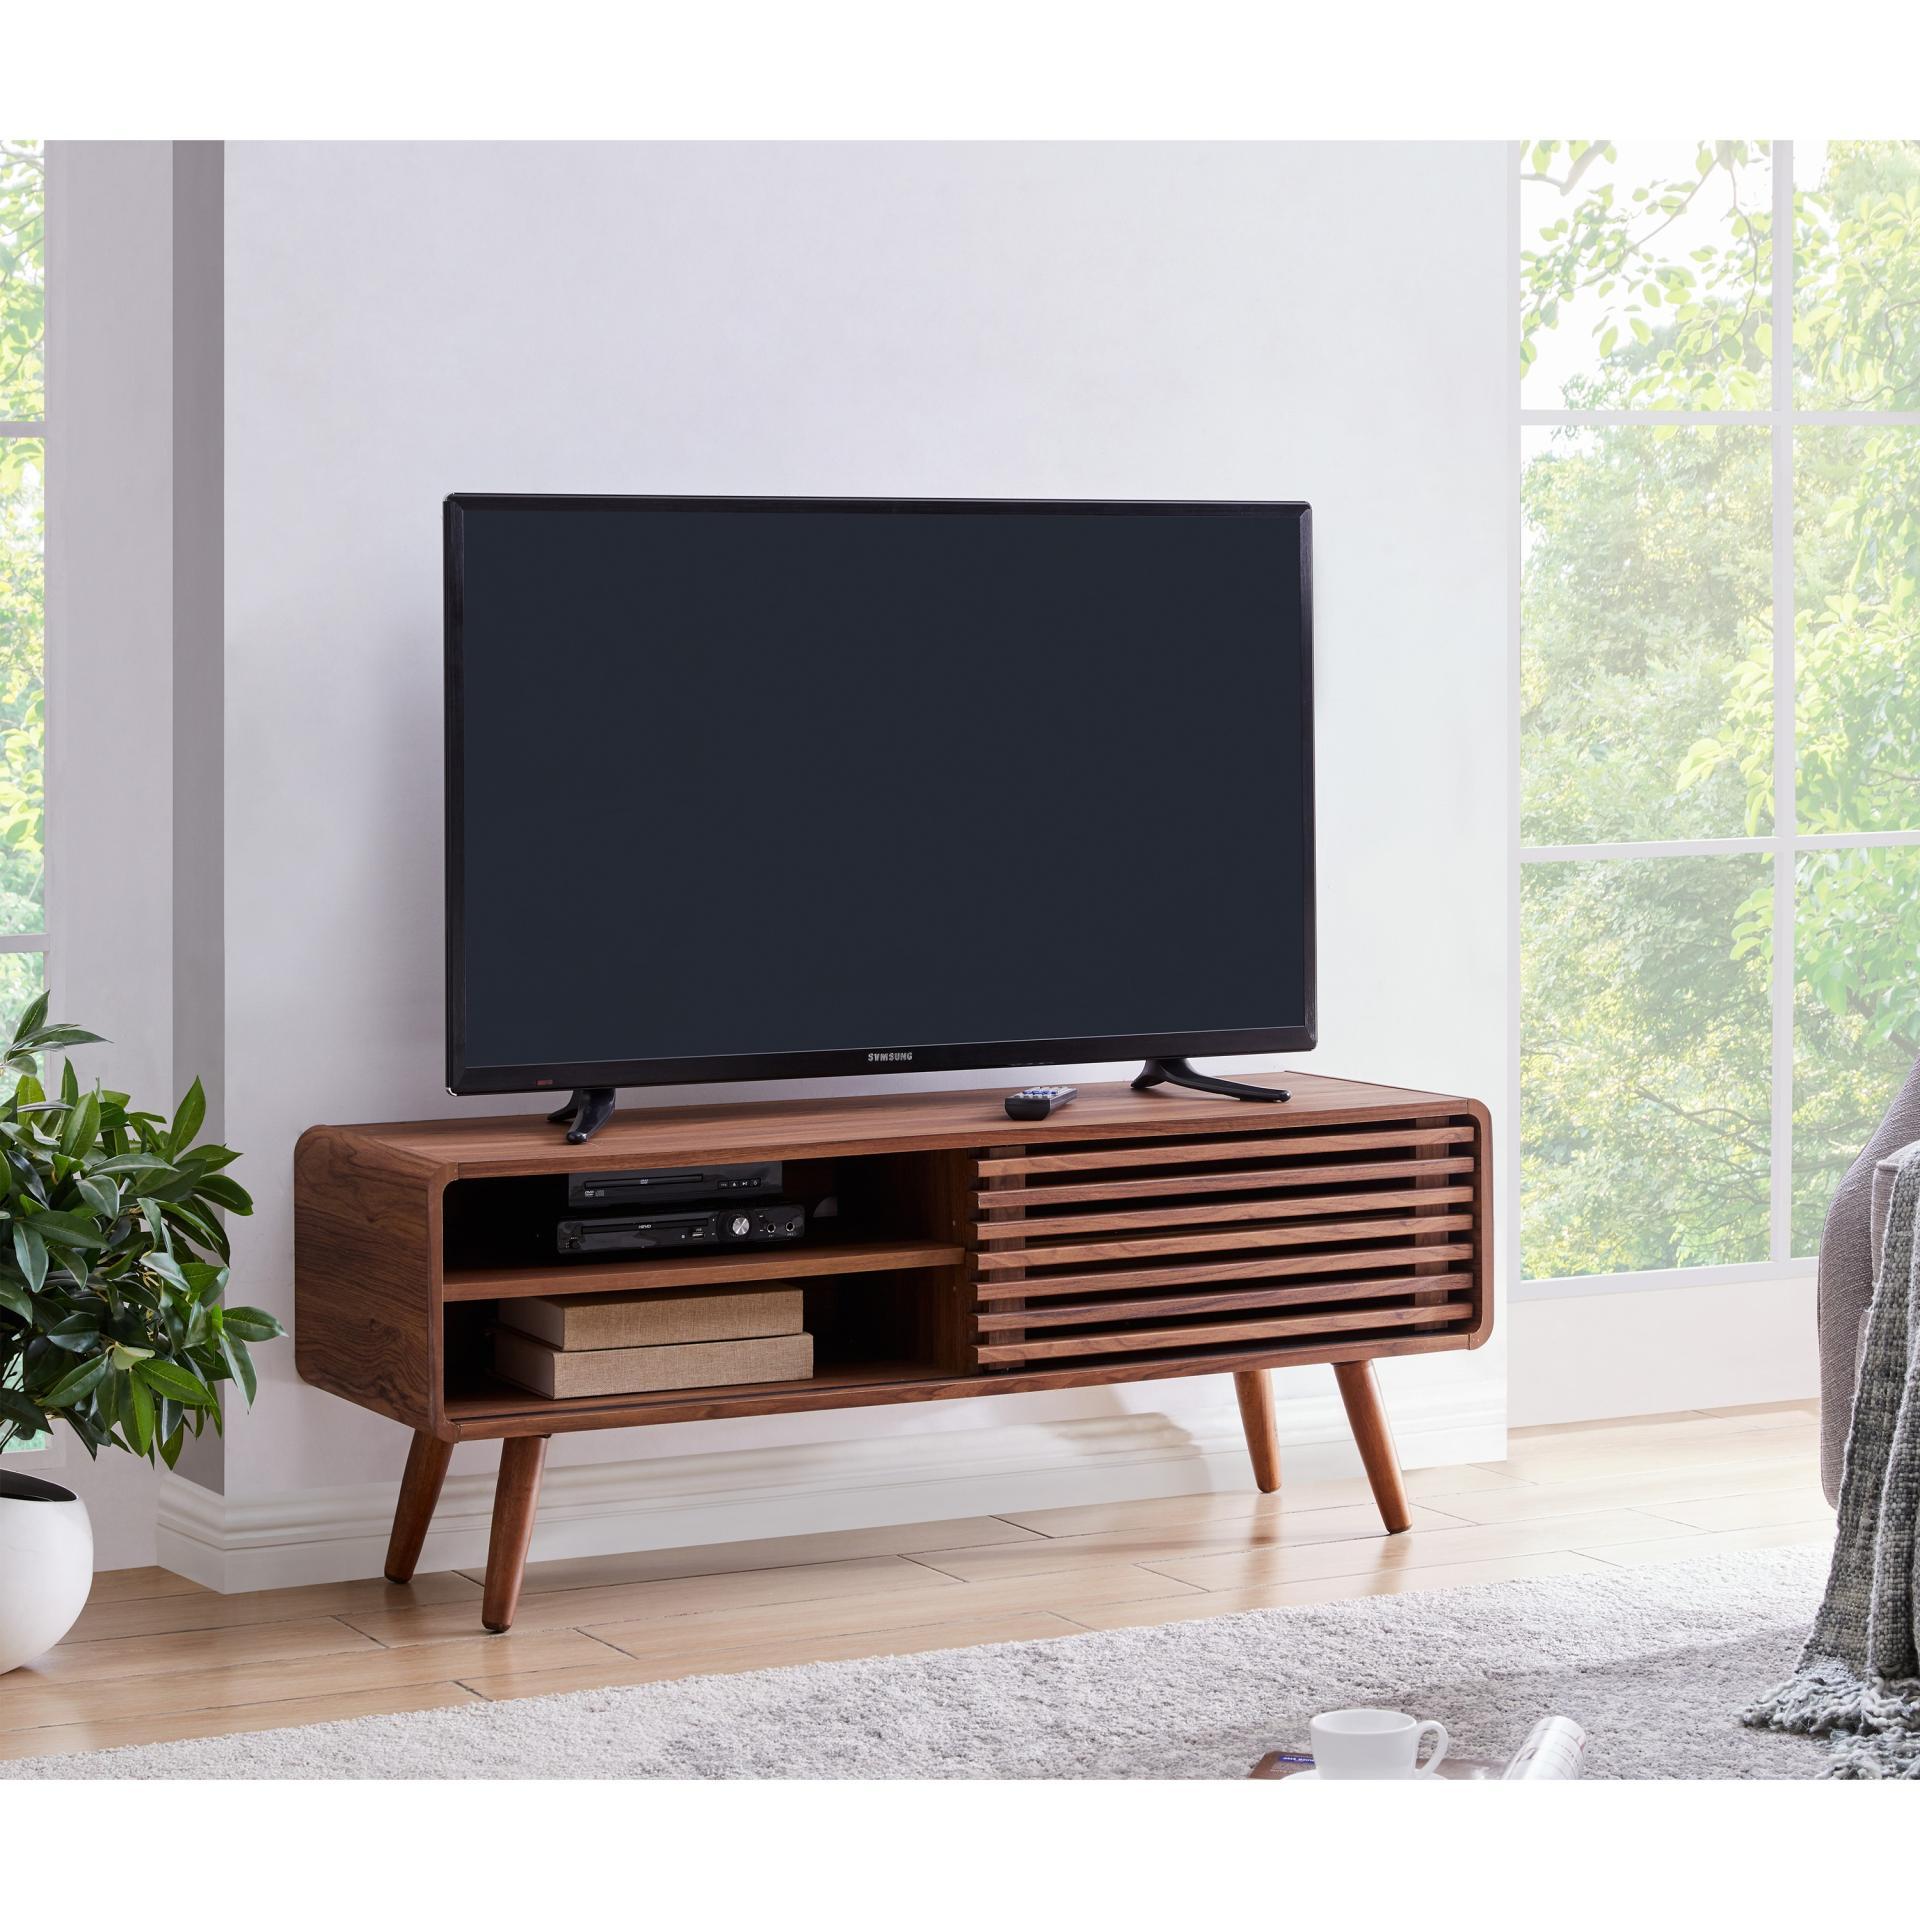 Wilson 46 Slat Low Tv Stand American Furnishings Dublin